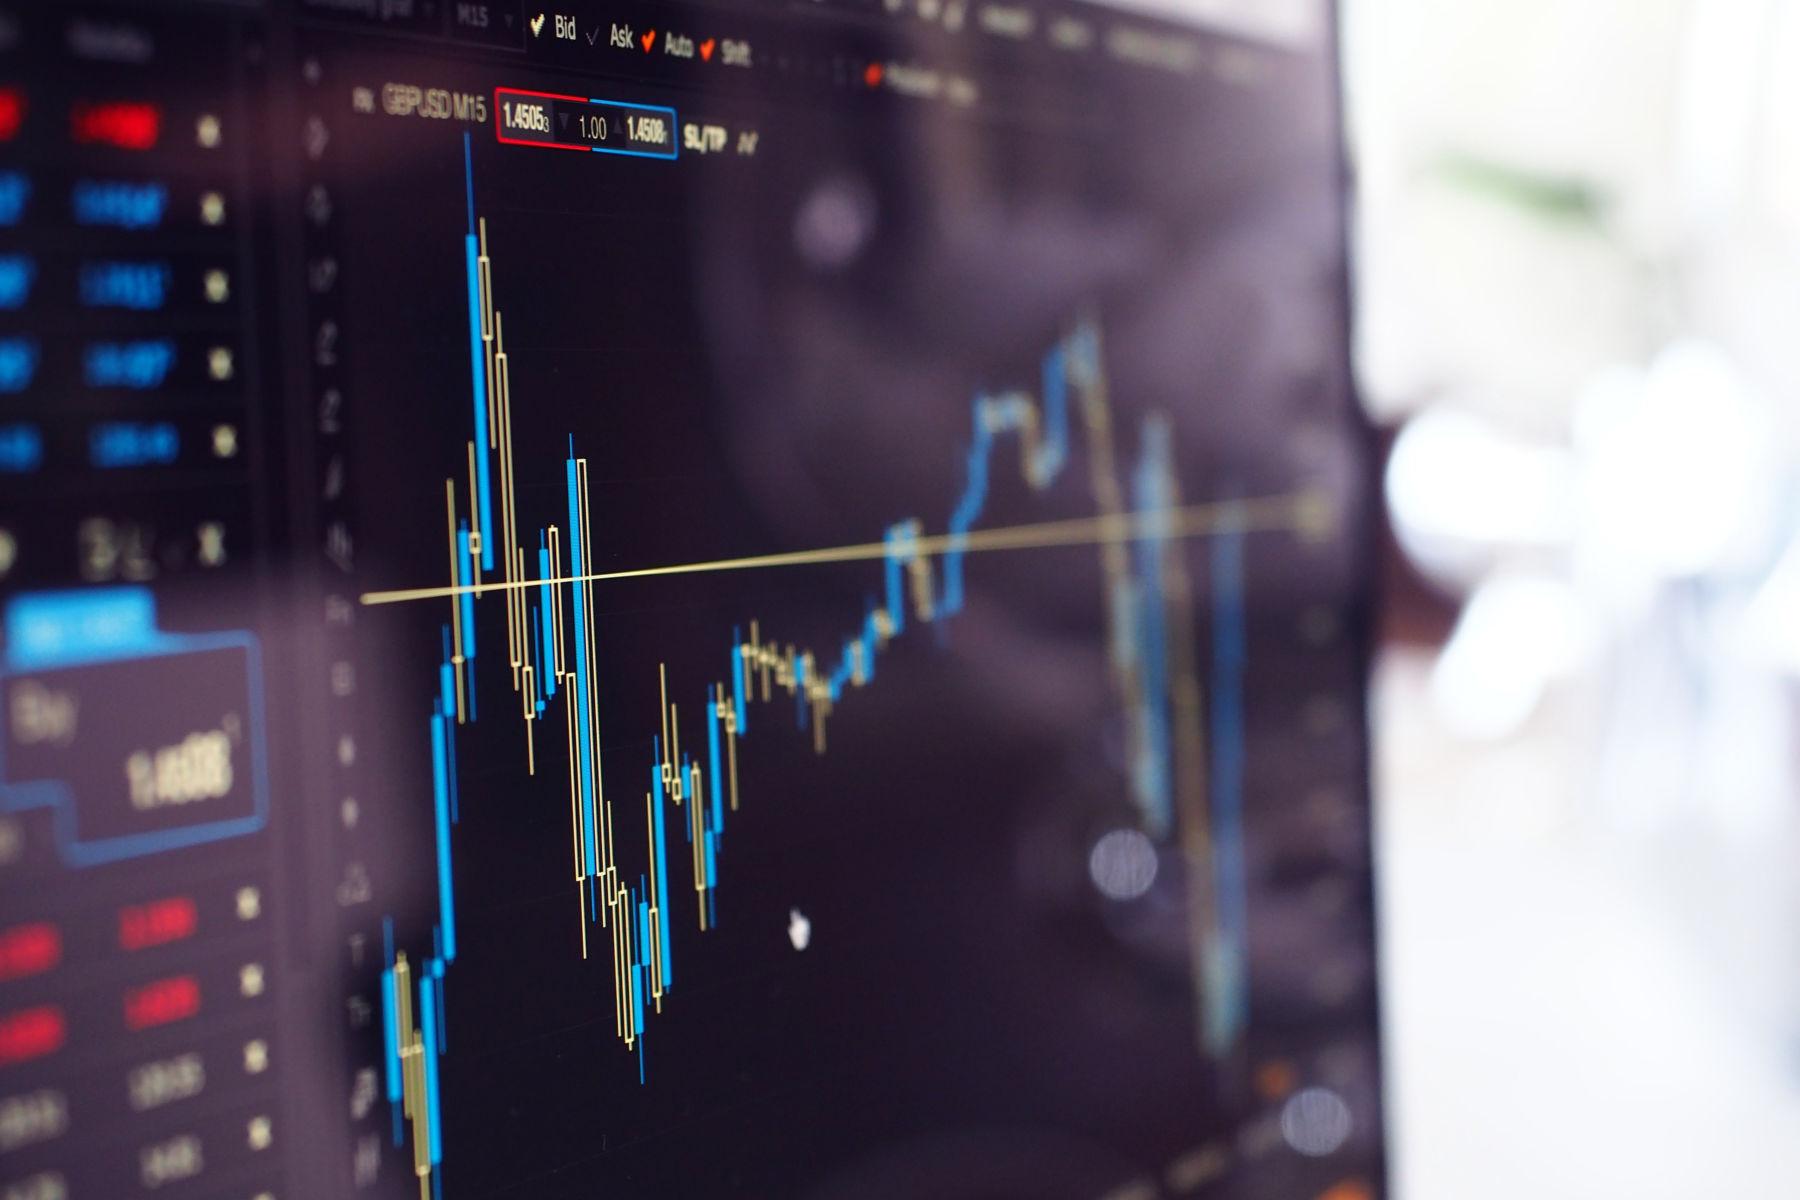 Predictive analytics & health monitoring systems